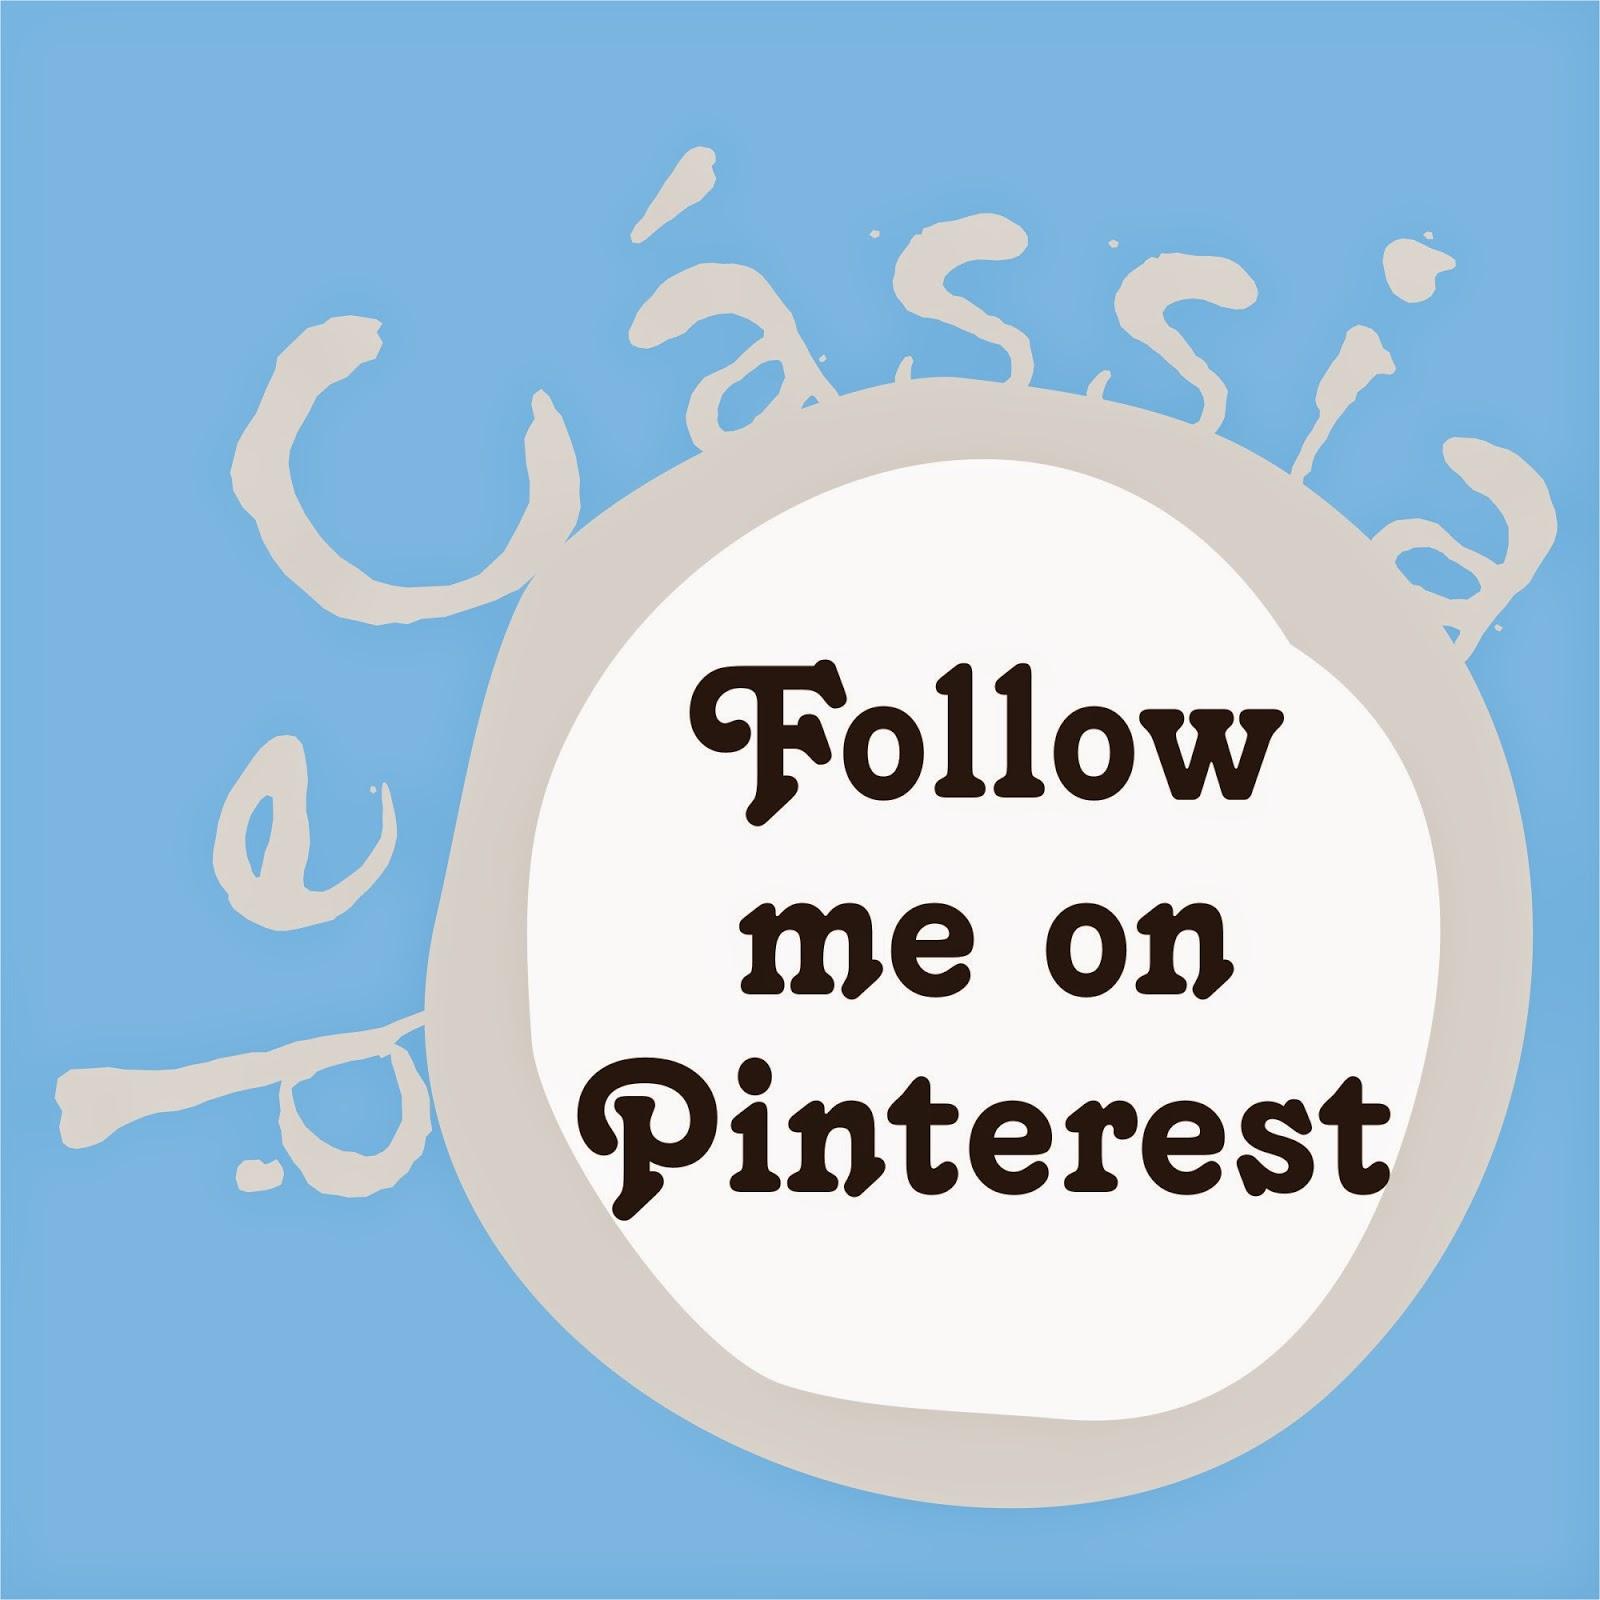 http://www.pinterest.com/dcassia222/